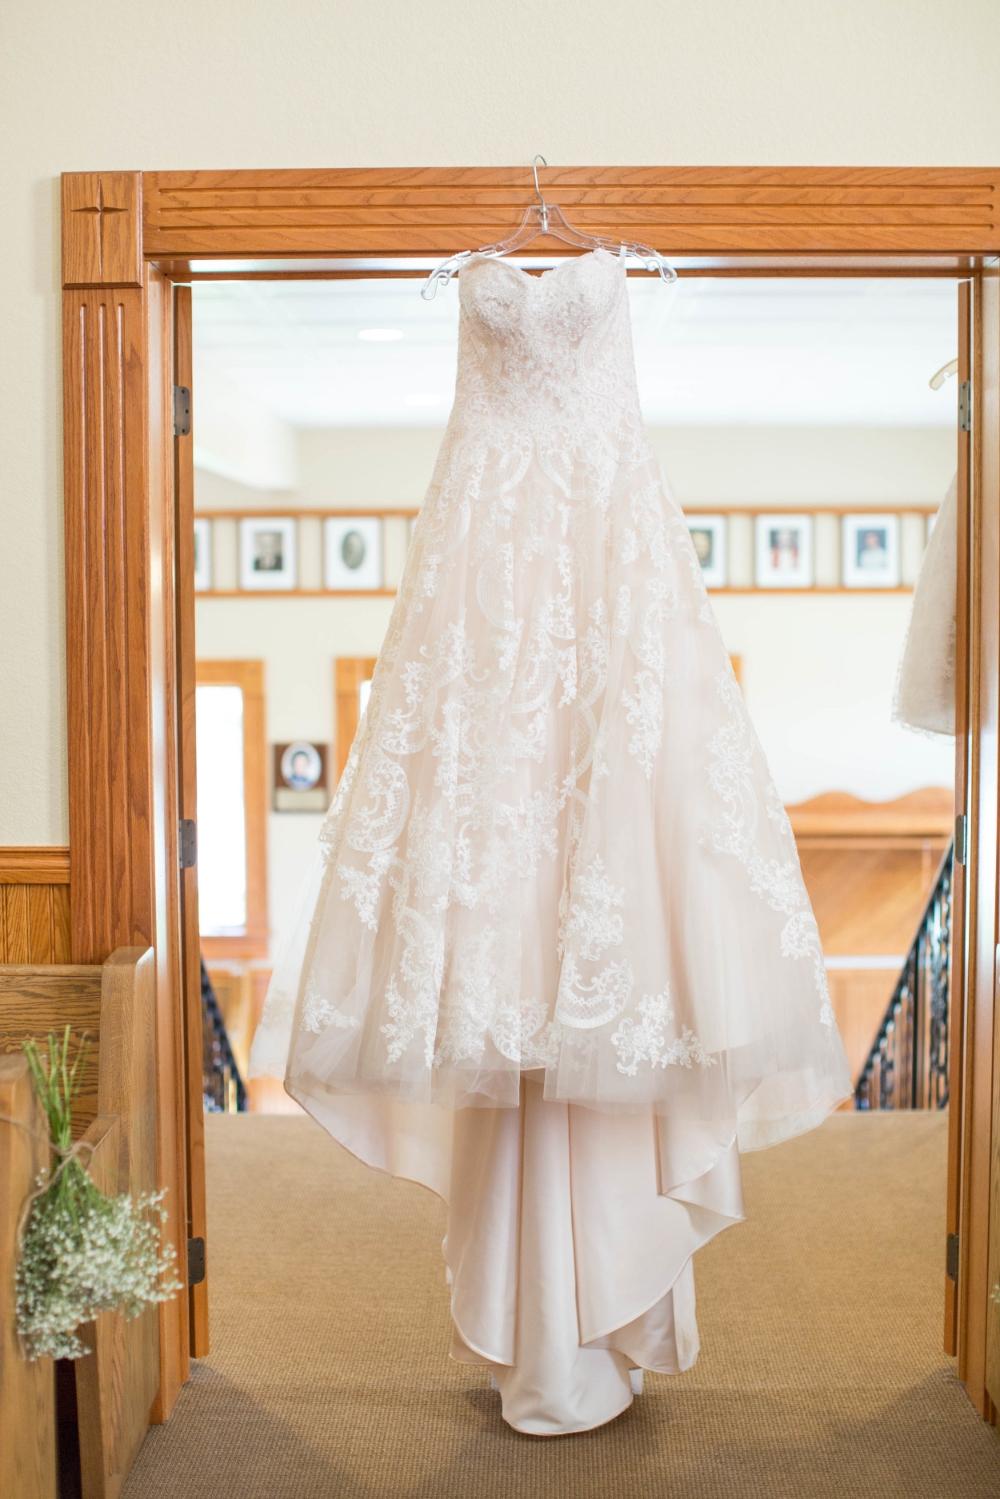 #mnwedding #mnphotographer #countrycharm #bride